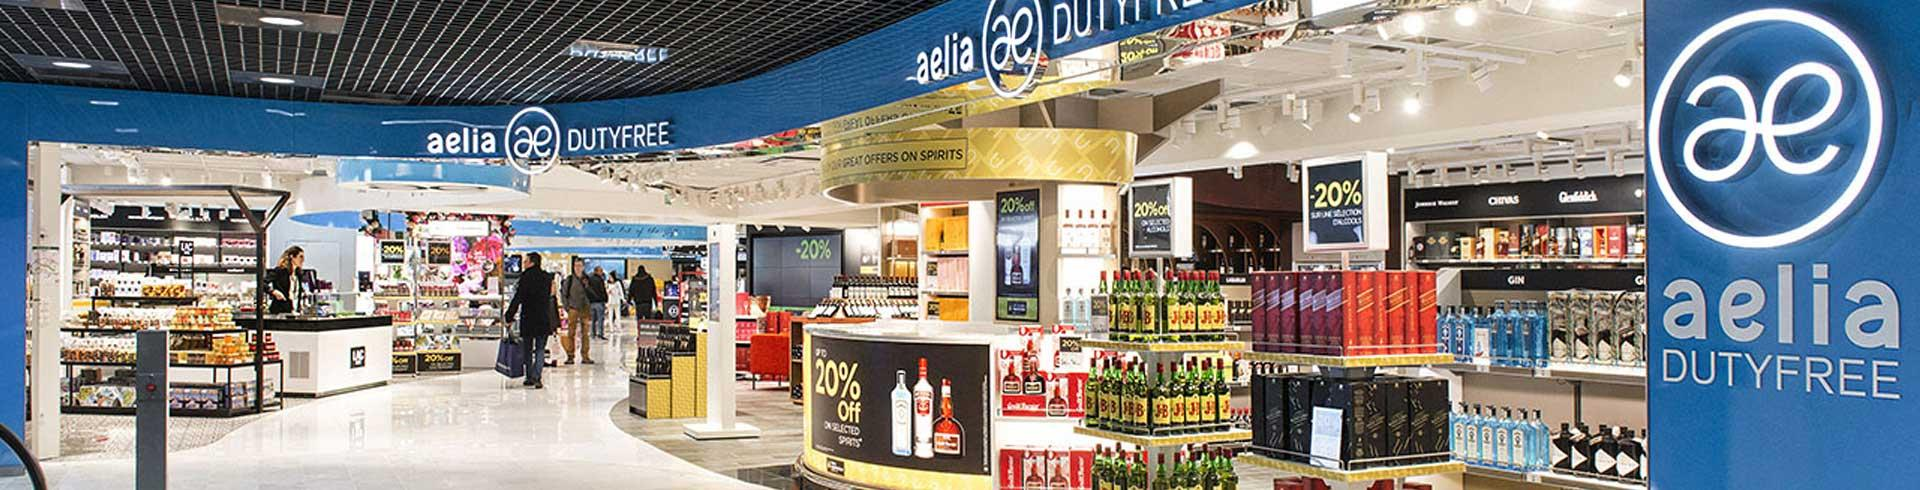 Nearest Car Rental Place >> Aelia Duty Free A / Liquor & Perfumes / Terminal 2 / Shops & Services / La Promenade / Nice ...